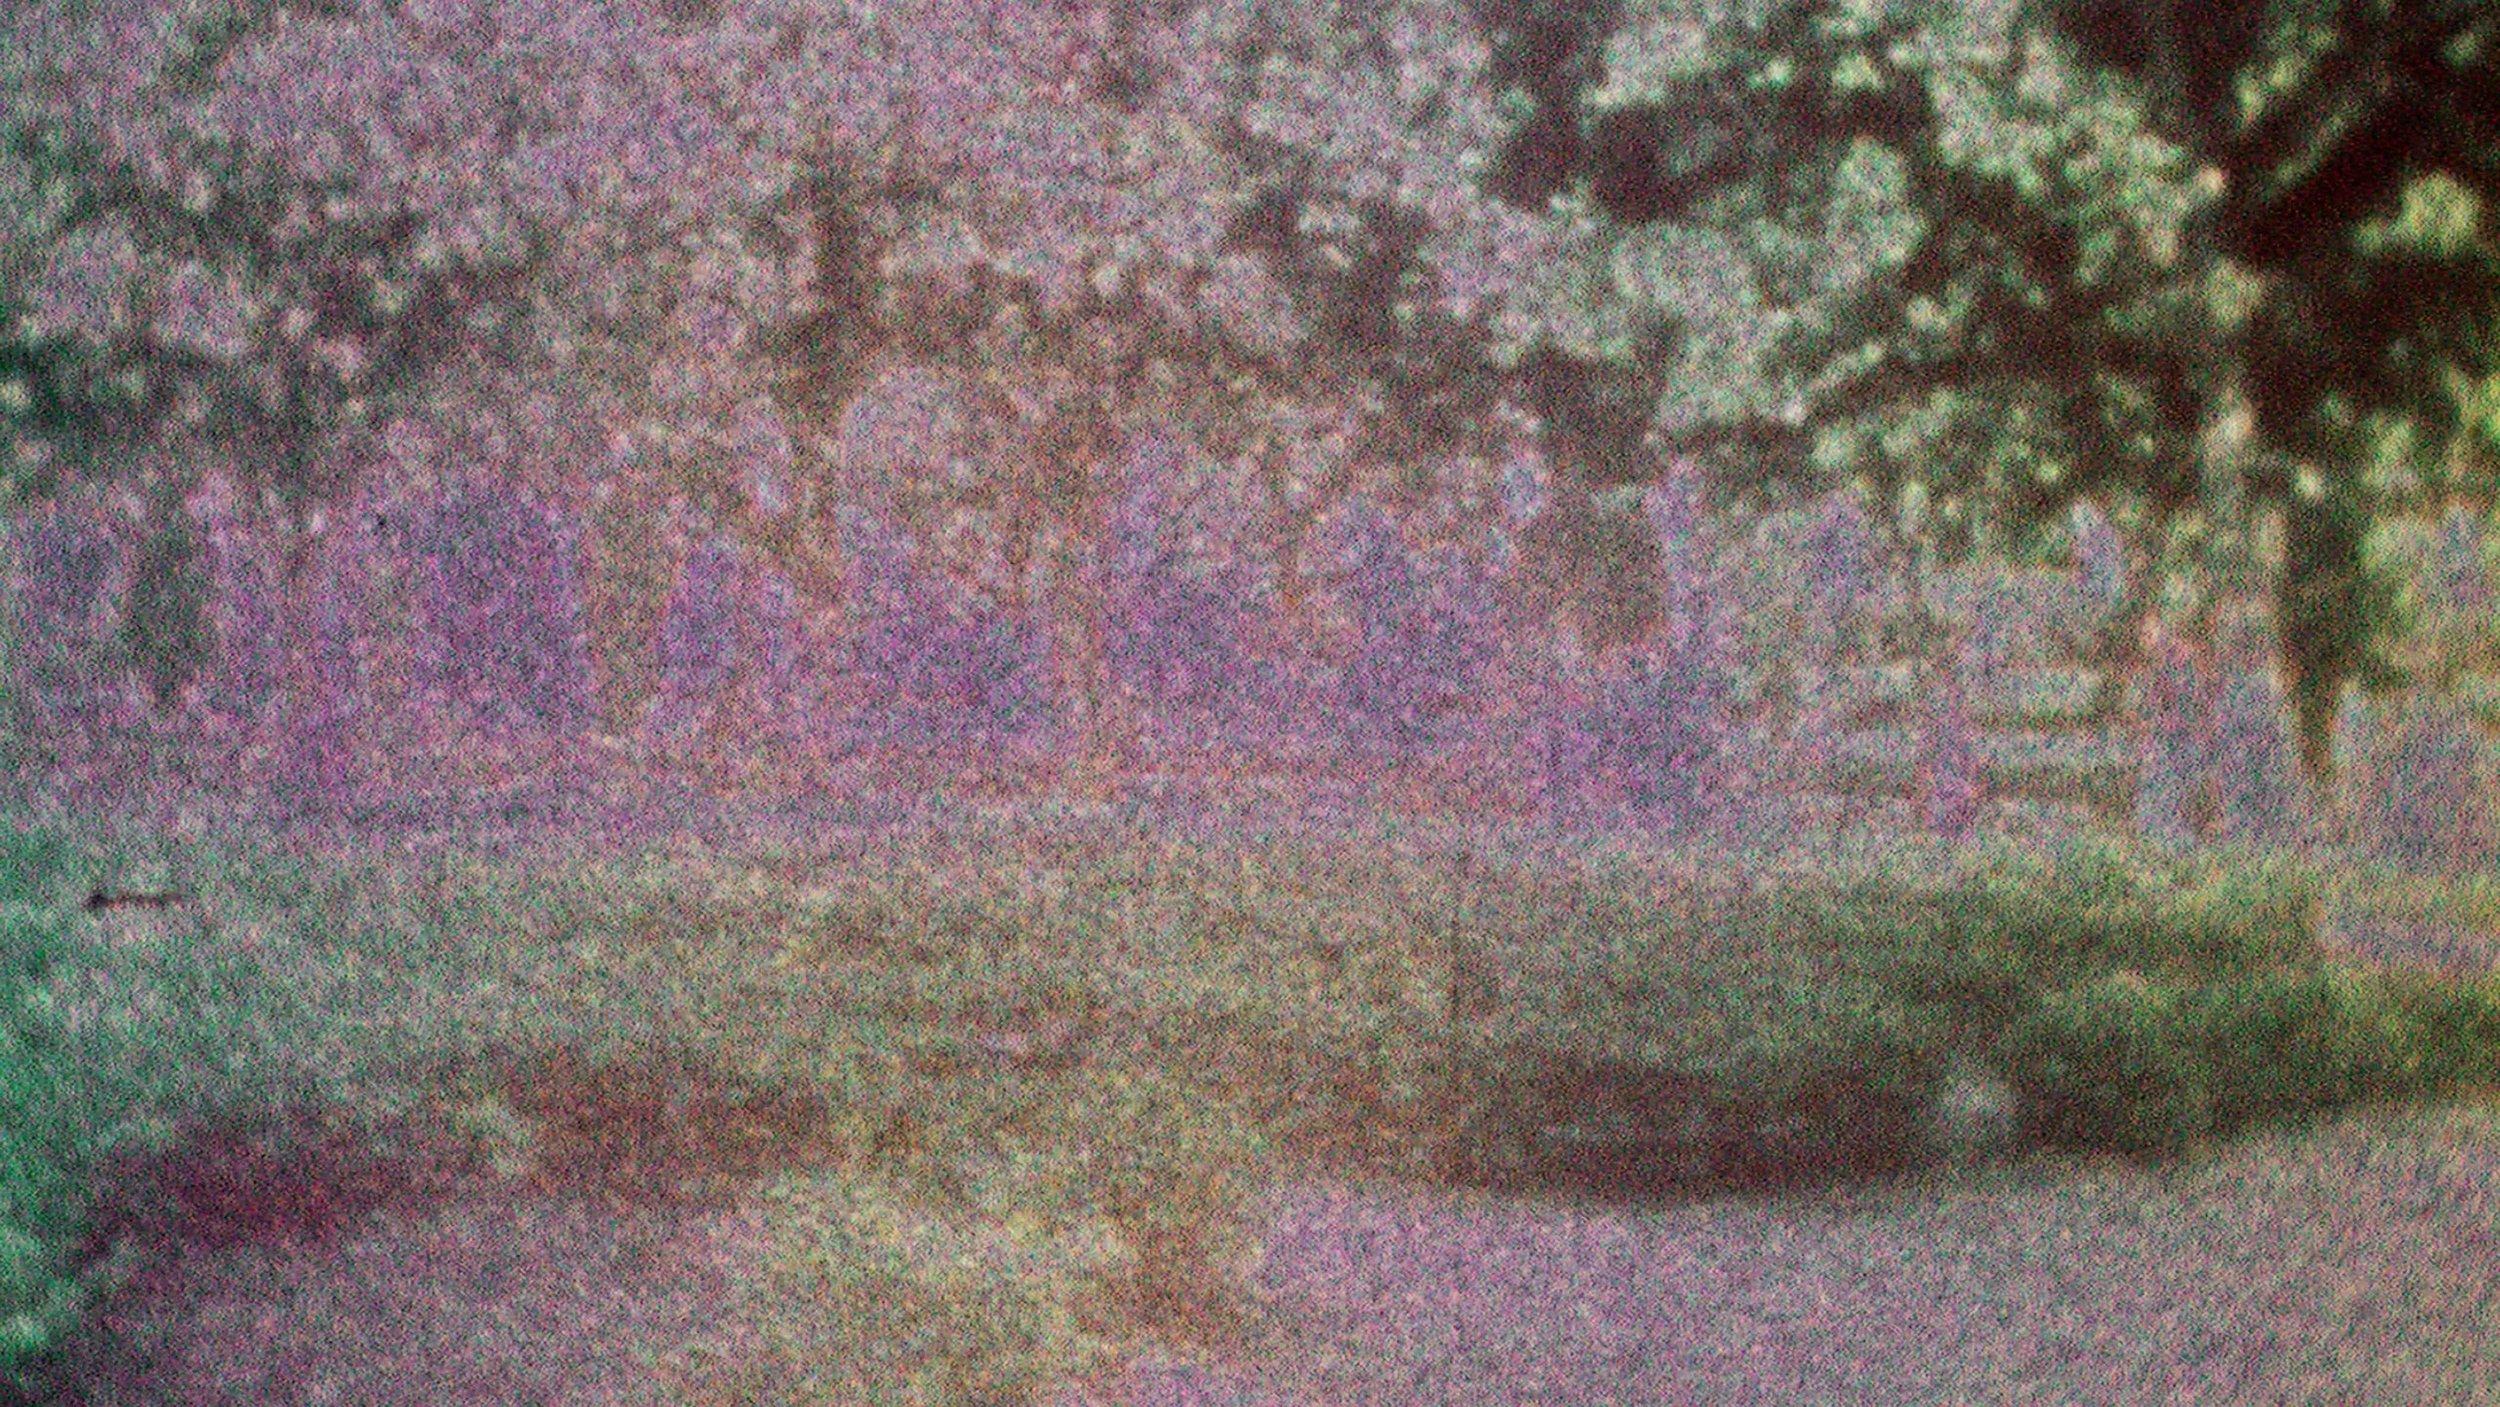 Catherine Sullivan, Triangle of need,  2008, «SVEMA TSO-50A 8MM #2», two C-Print, 2, 33,9 x 60 inches / 86,12 x 152,40 cm